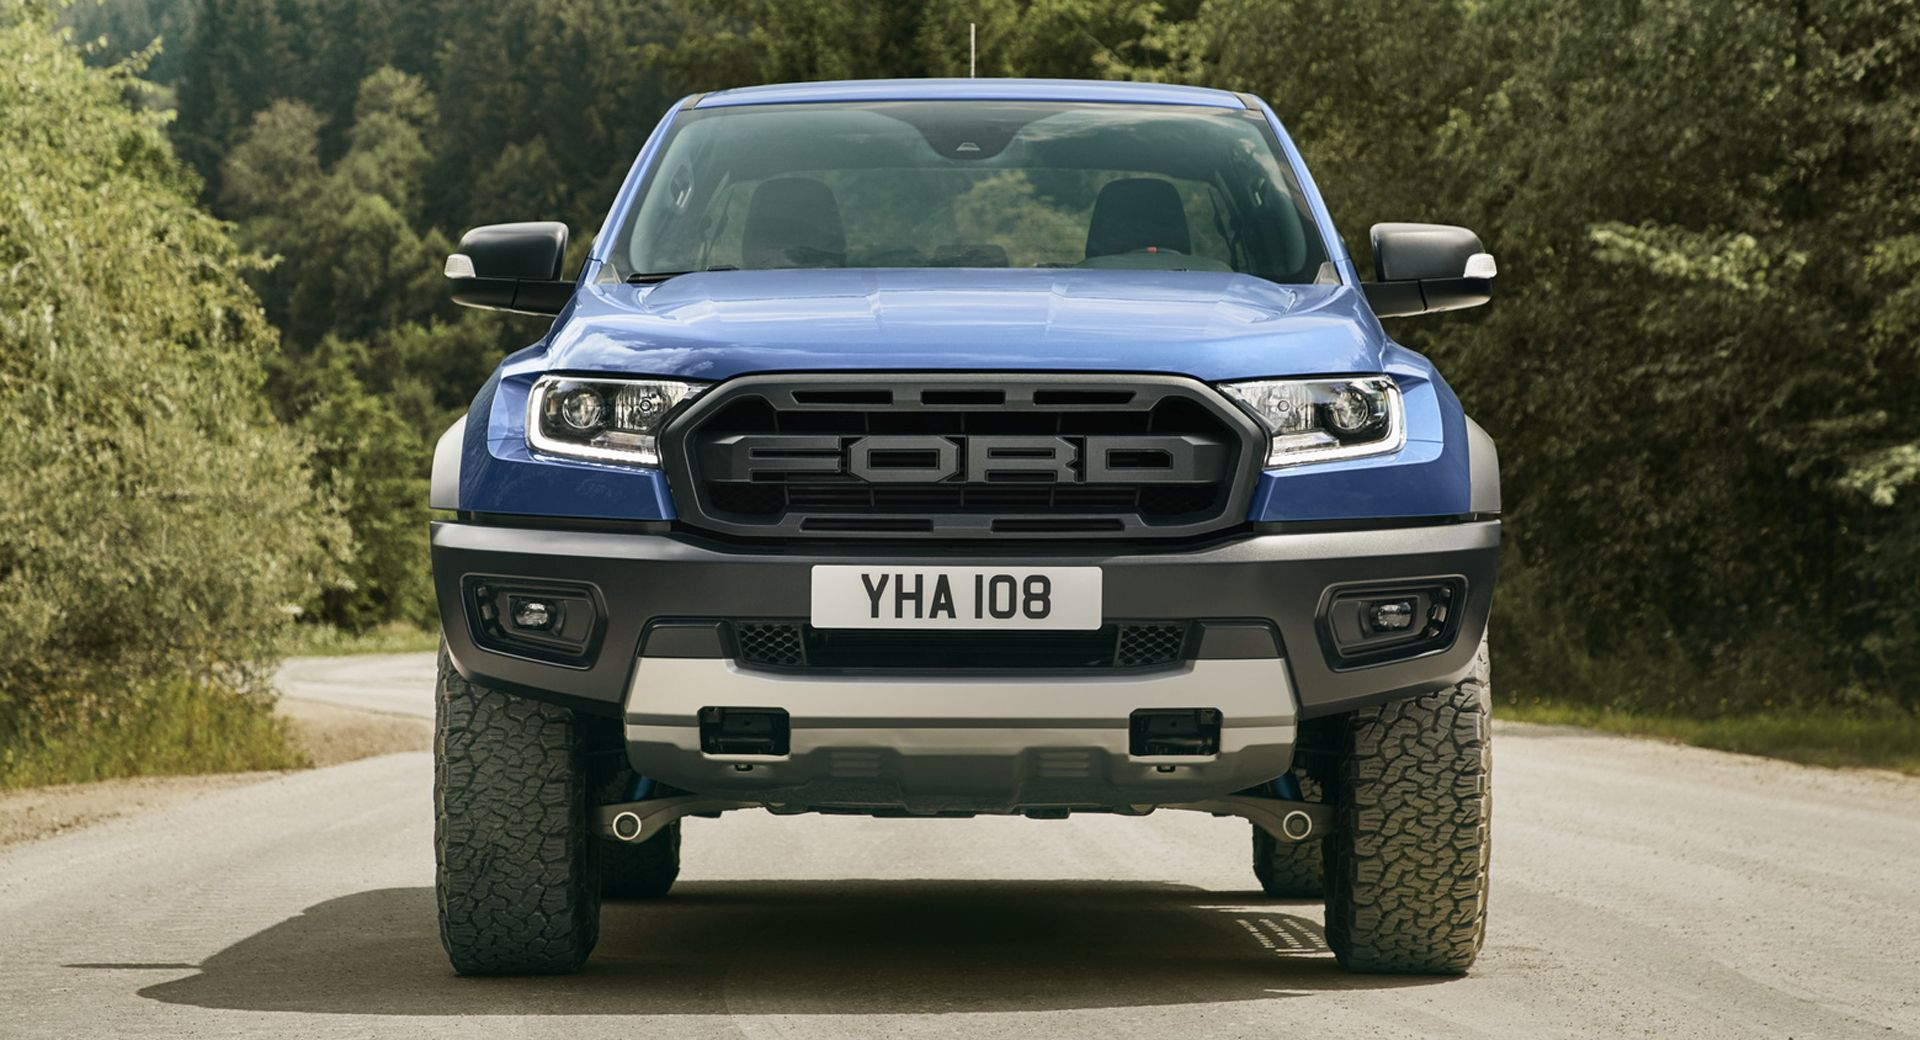 Australia S Tickford Says It Could Lift Ford Ranger Raptor V8 Up